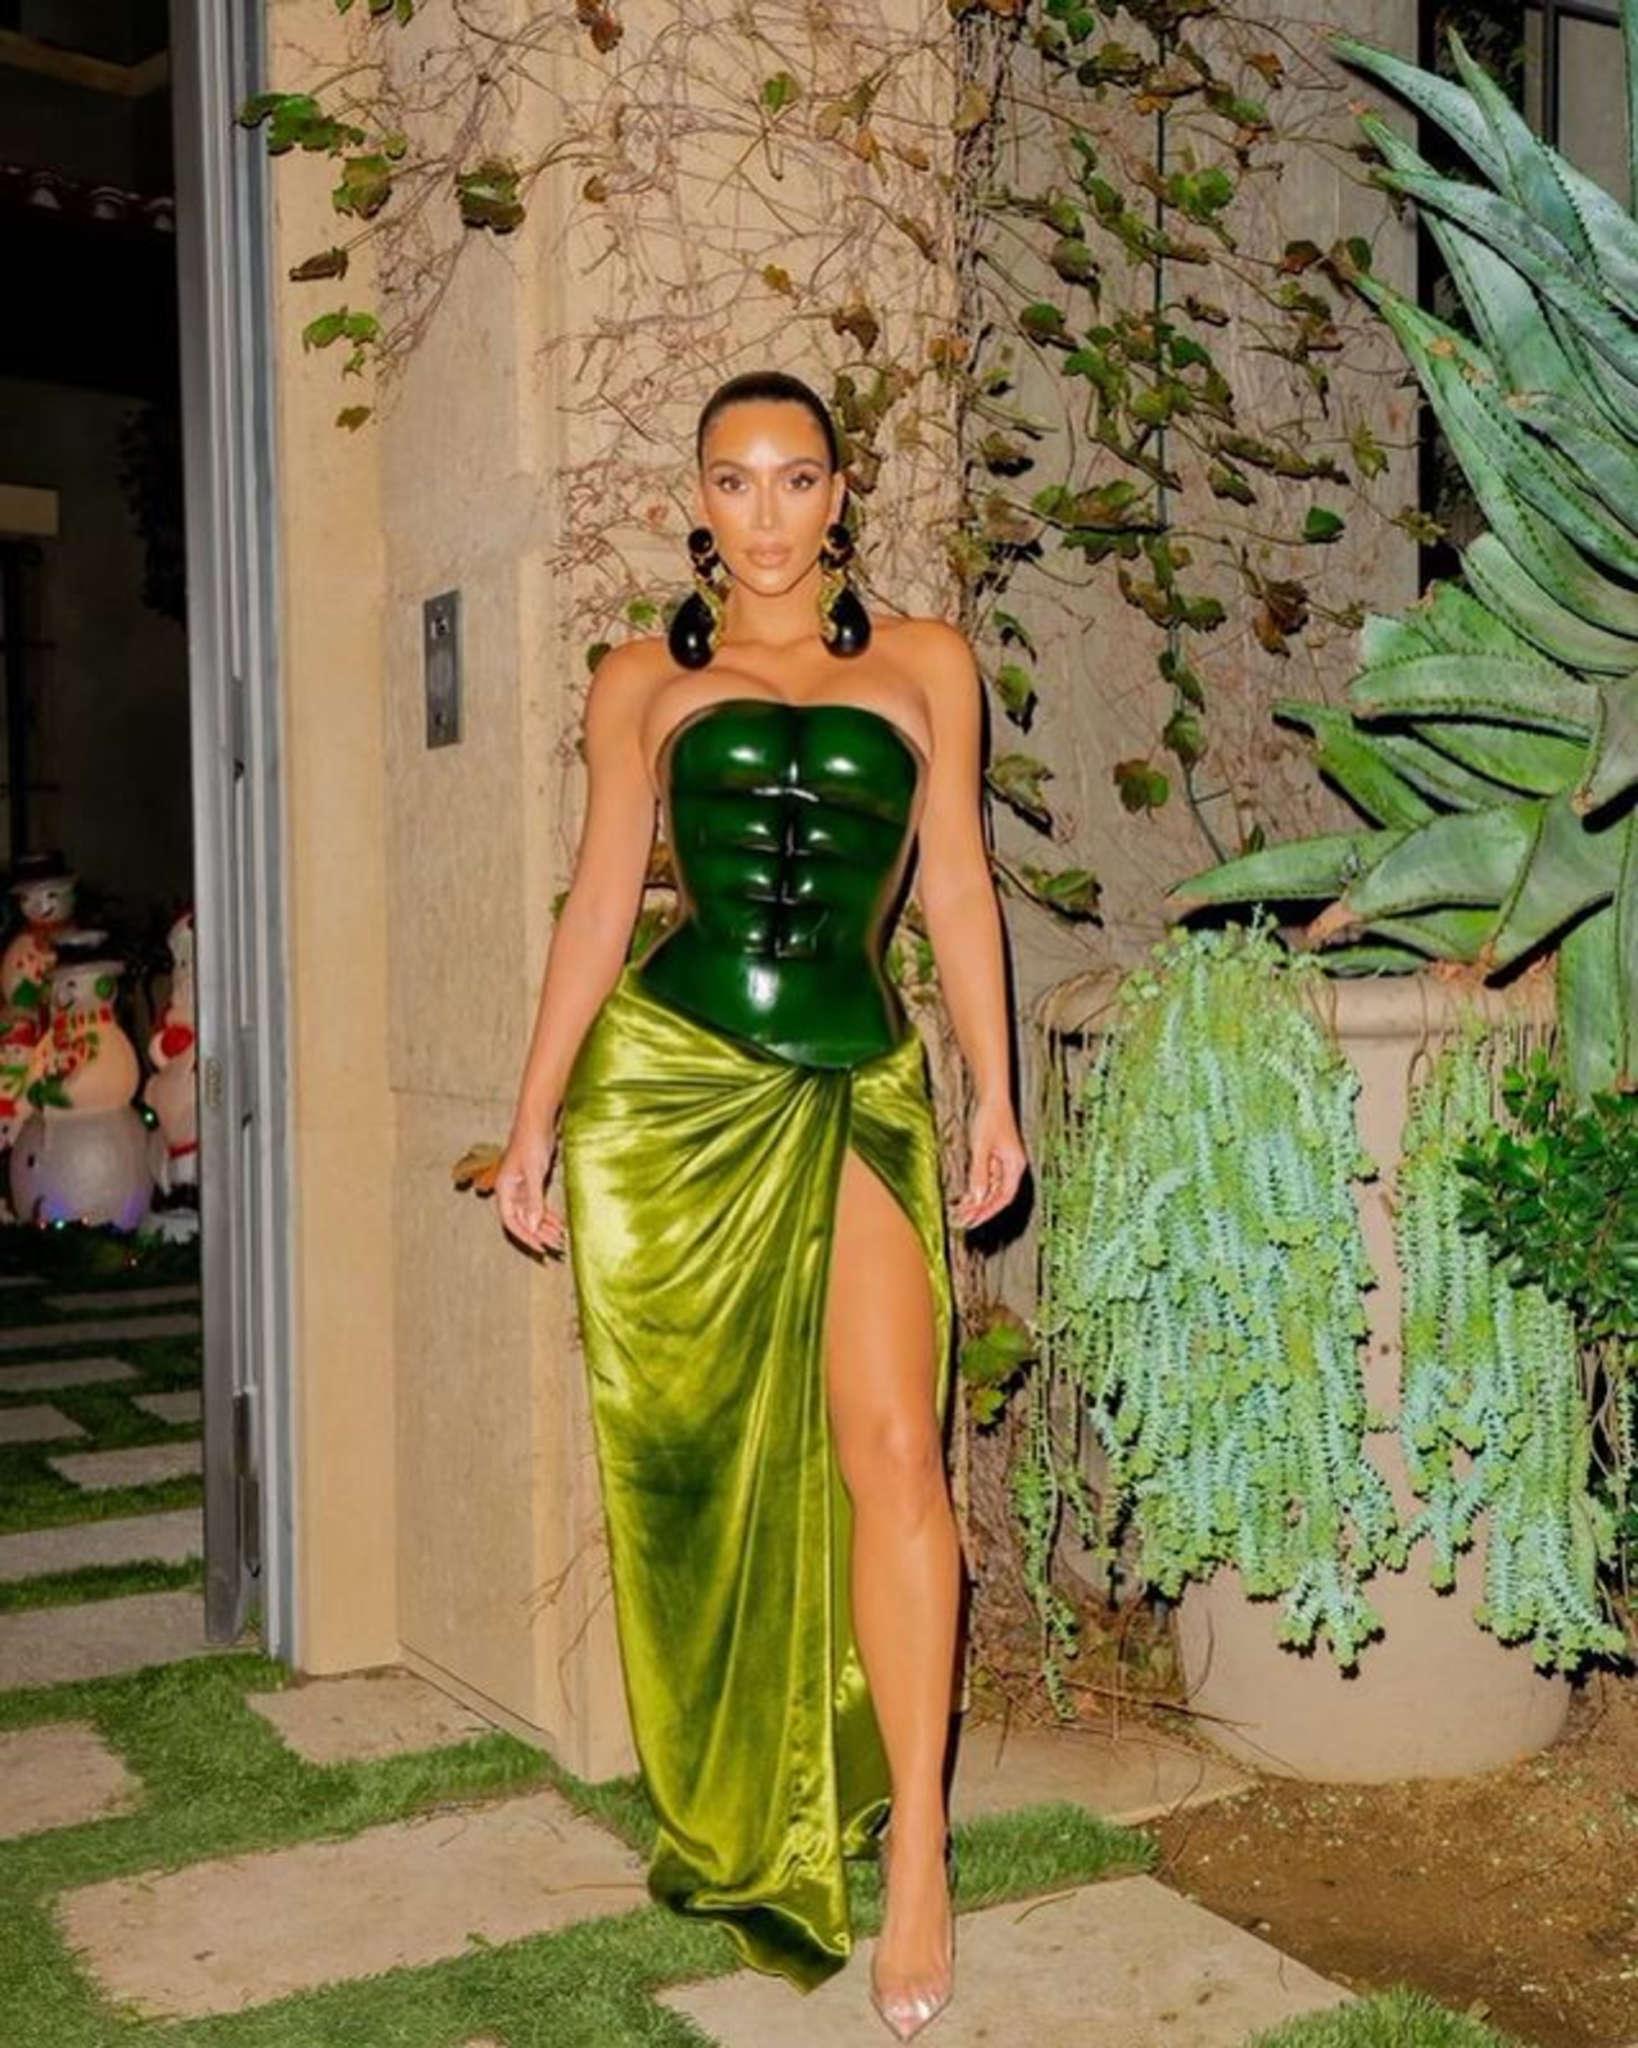 1609010270 849 Kim Kardashian Wore Custom Schiaparelli Serpent Gown With Snake Earrings